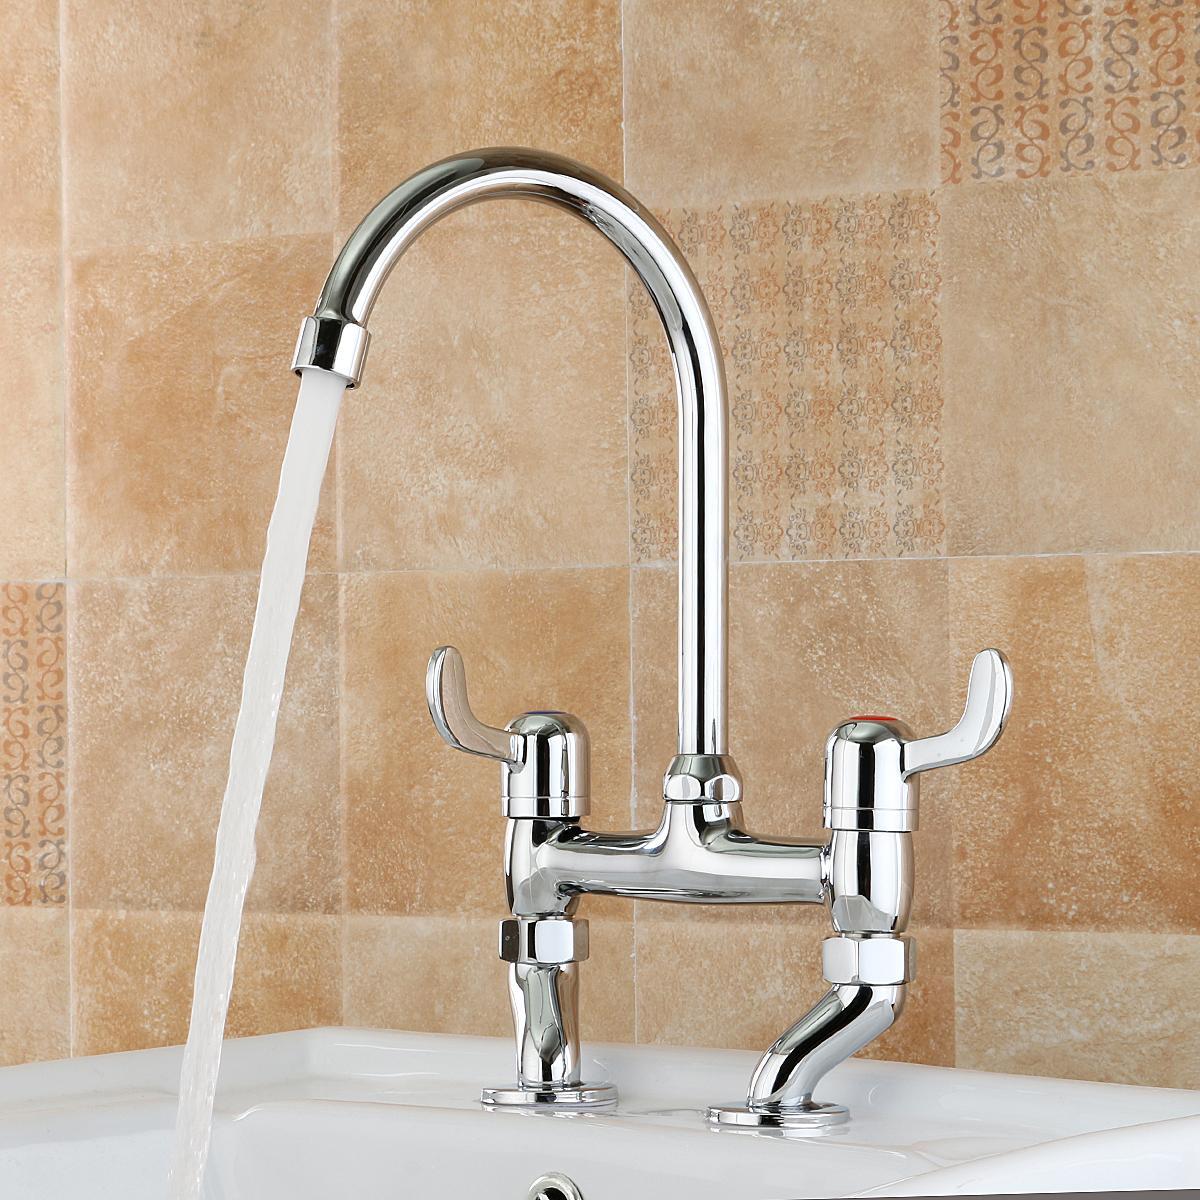 TAPCET Chrome Bath Filler Mixer Shower Taps Bathroom & Kitchen Basin ...